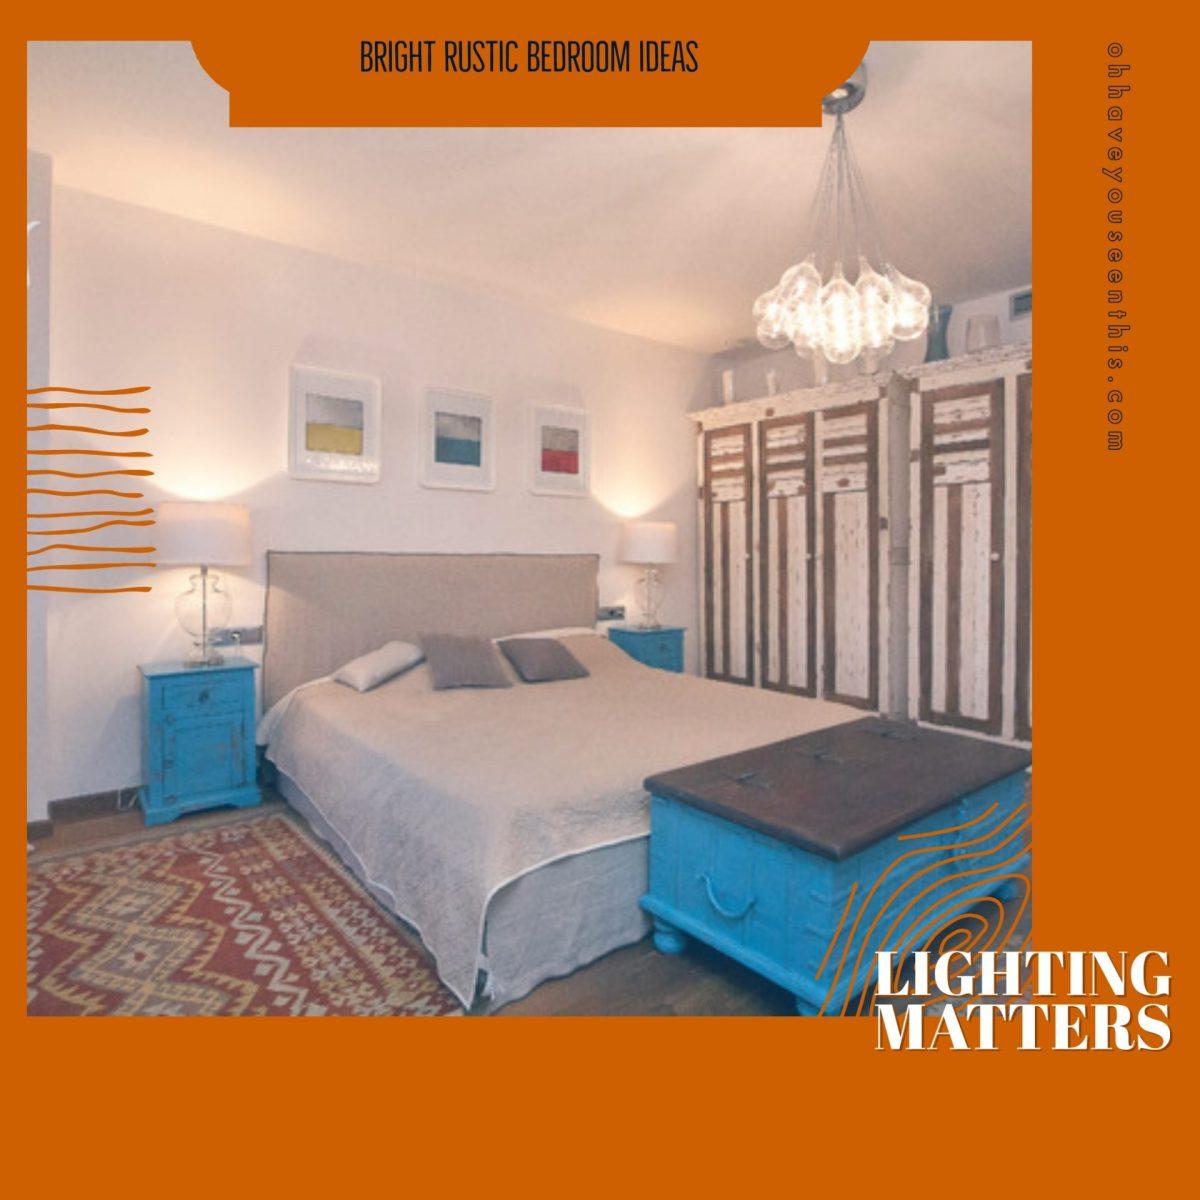 Bright Rustic Bedroom Ideas